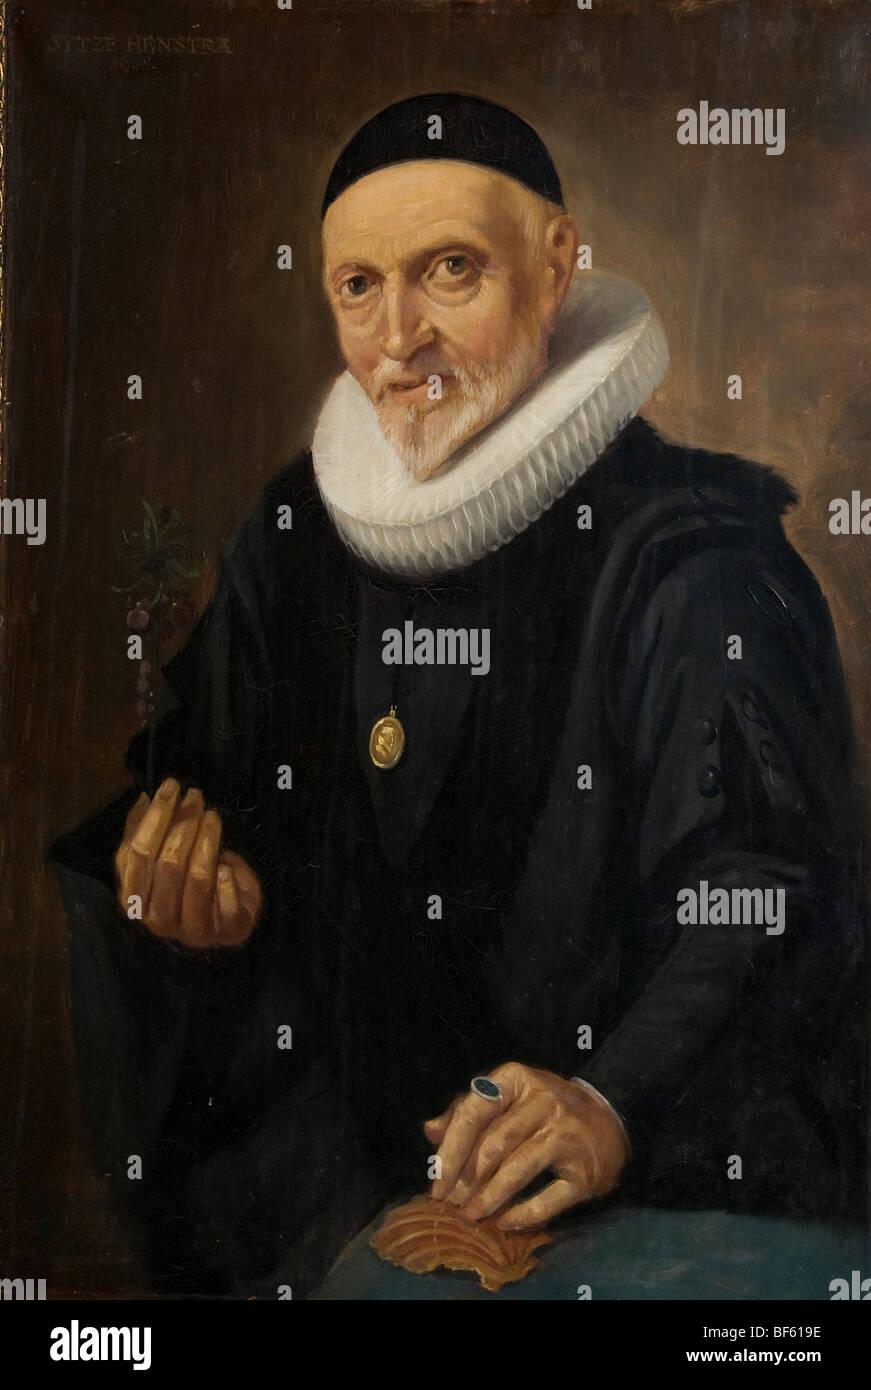 Chirurghijn chirurgien Chirurgie Museum Hoorn Pays-bas Hollande l'âge d'or de COV Photo Stock